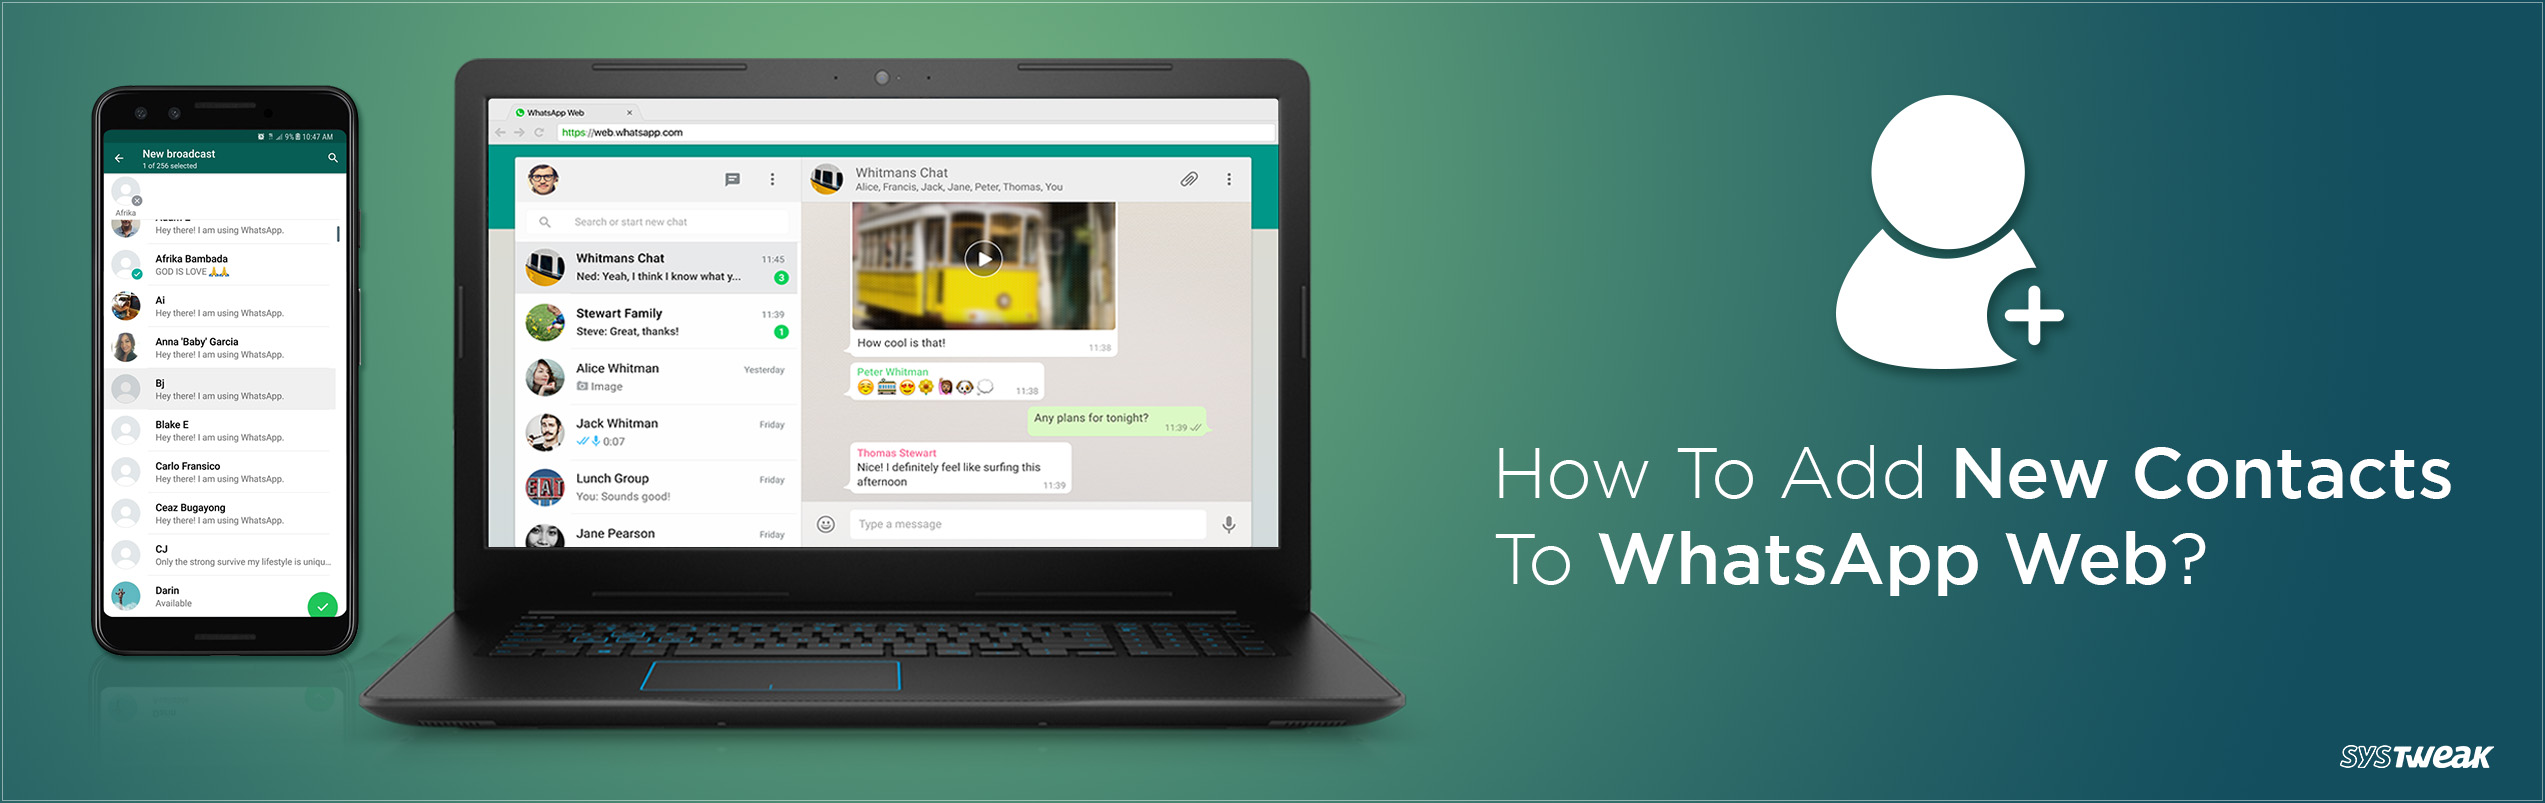 dd17b7bc434580 Guide To Save New Contacts on WhatsApp Via WhatsApp Web